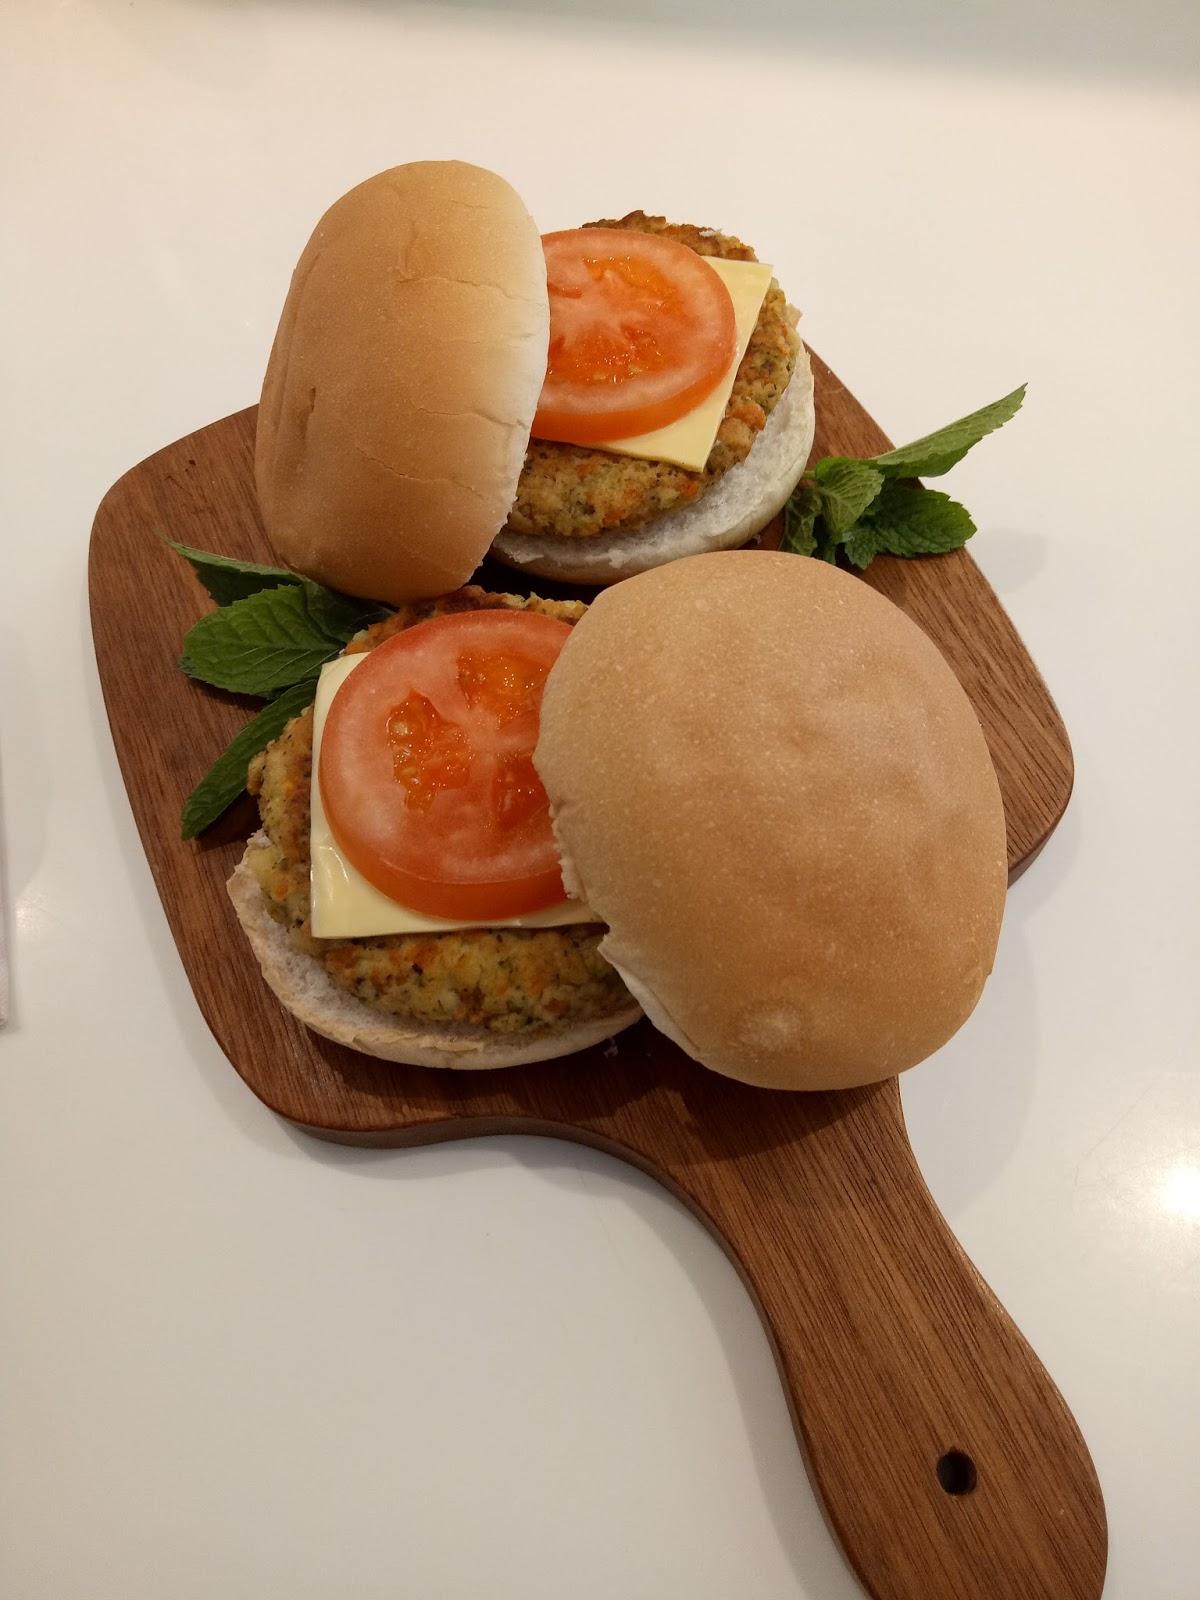 resepi burger cendawan anyar bb Resepi Guna Roti Burger Enak dan Mudah